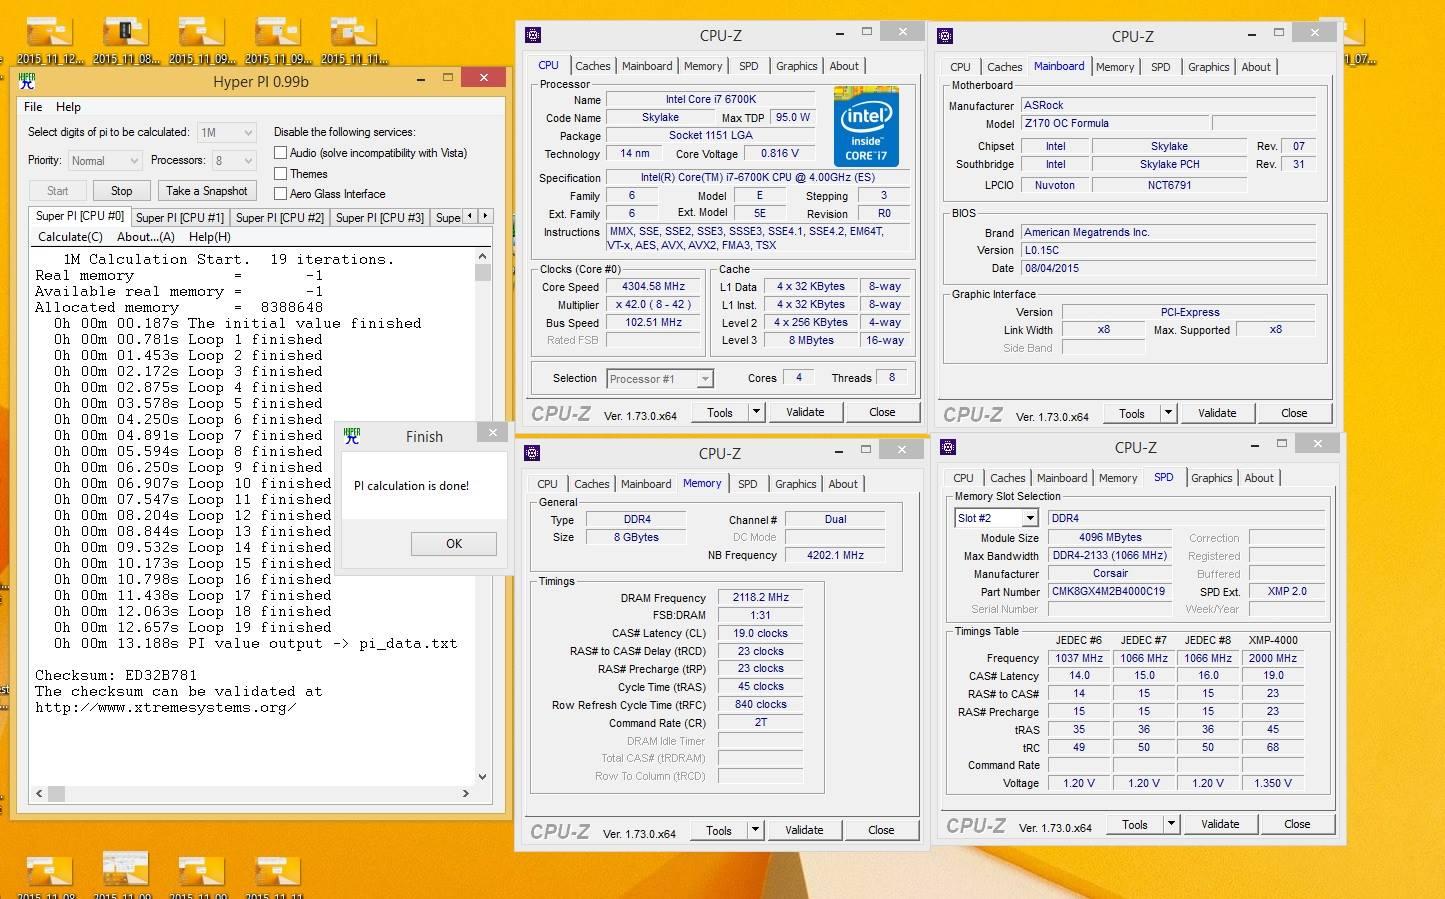 intel-core-i7-6700k_4000-mhz_ddr4-memory_3